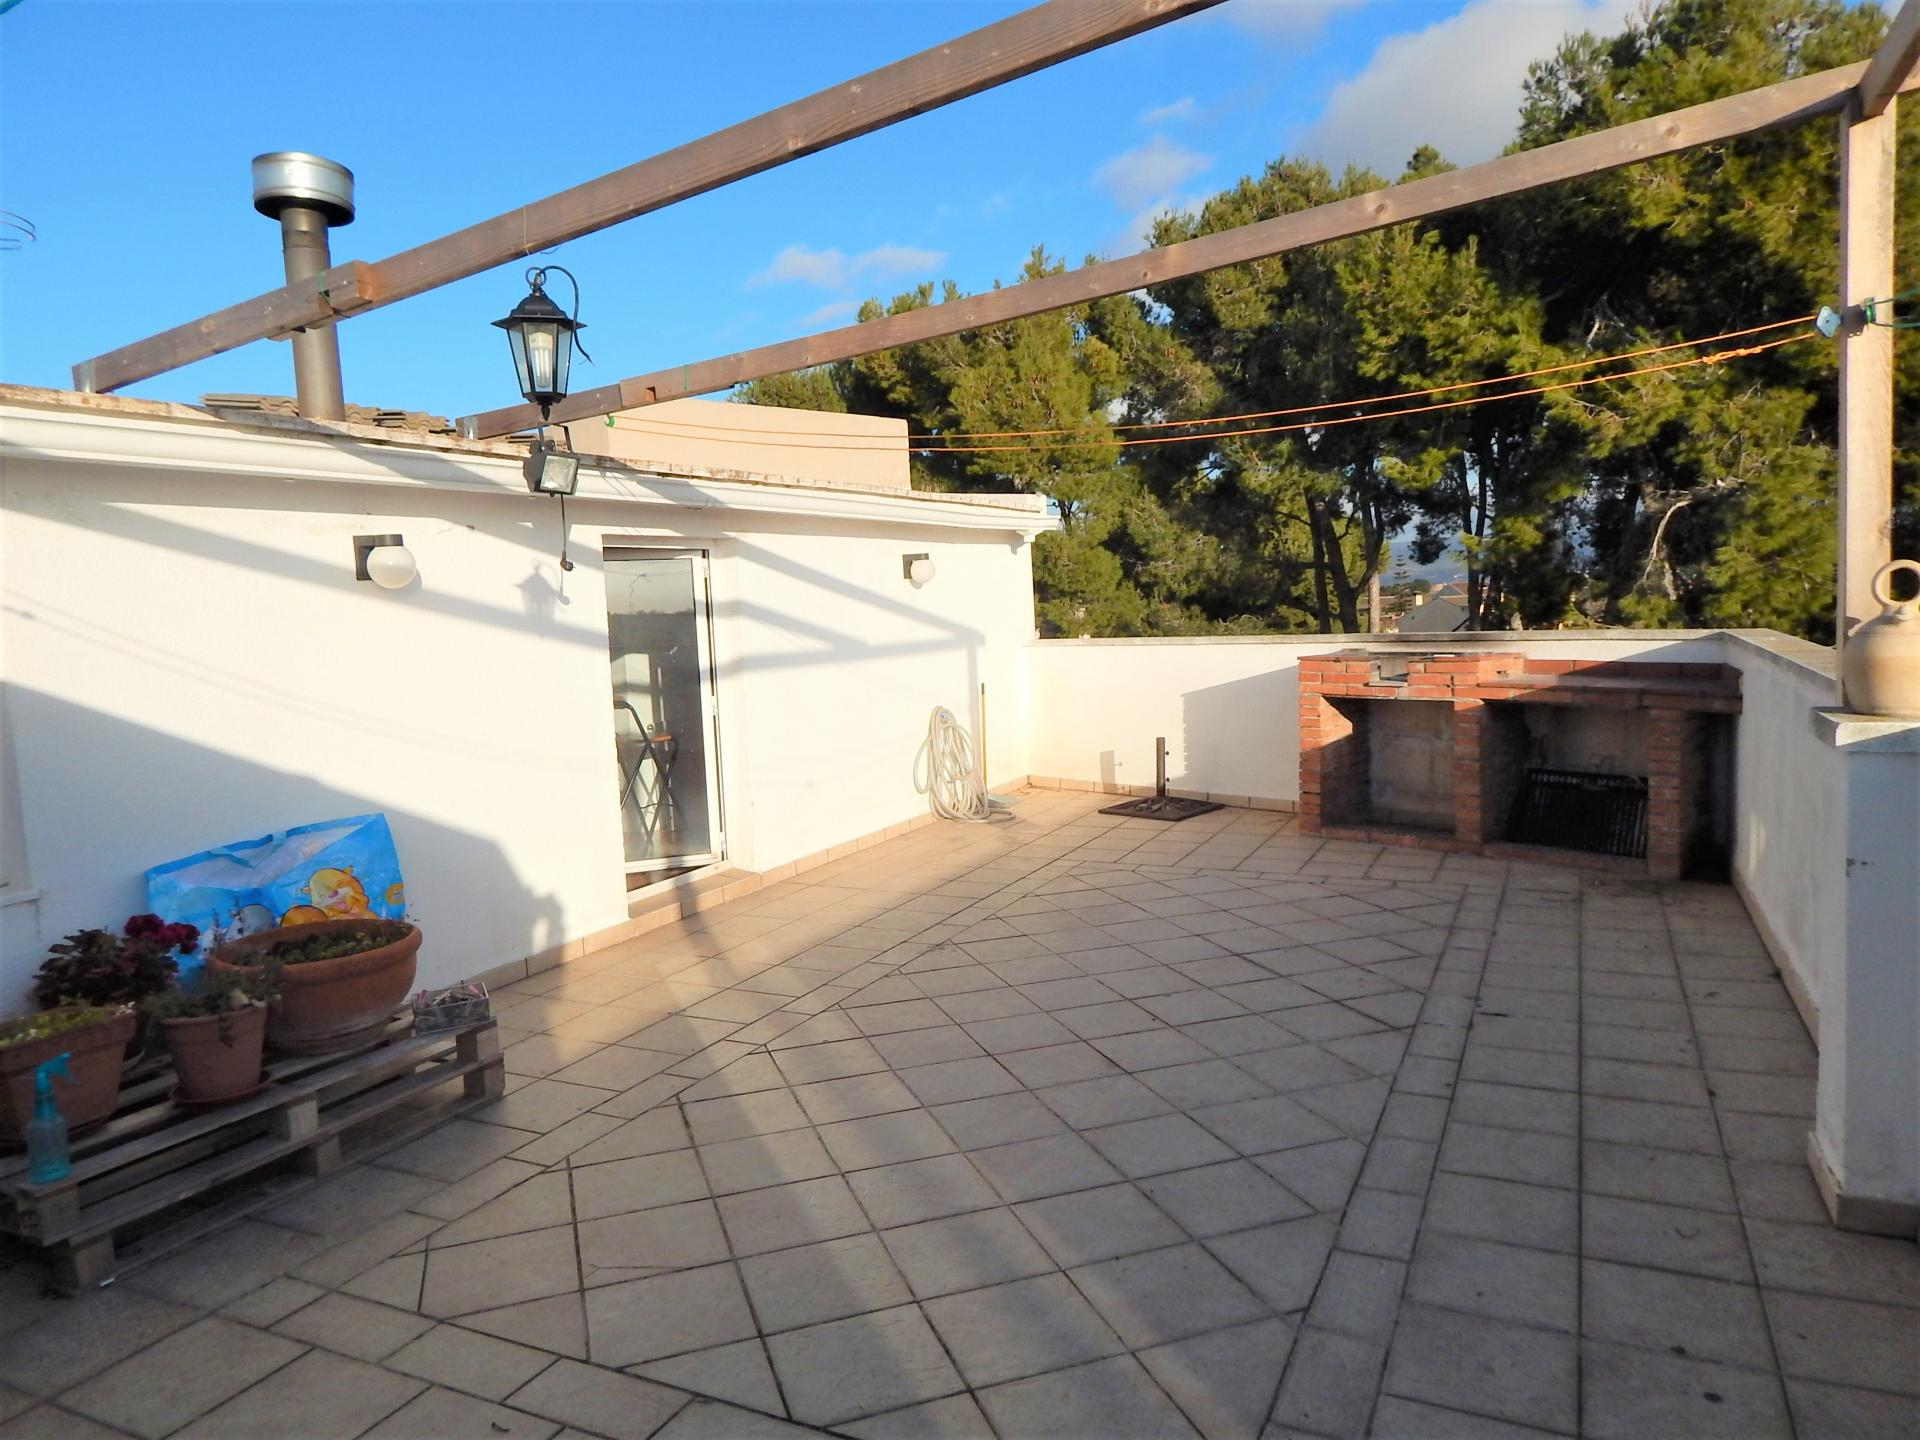 Foto 36 (V-722-2021) - Dúplex en Venda a Calle DOCTOR FLEMNG, 8, Granada, La